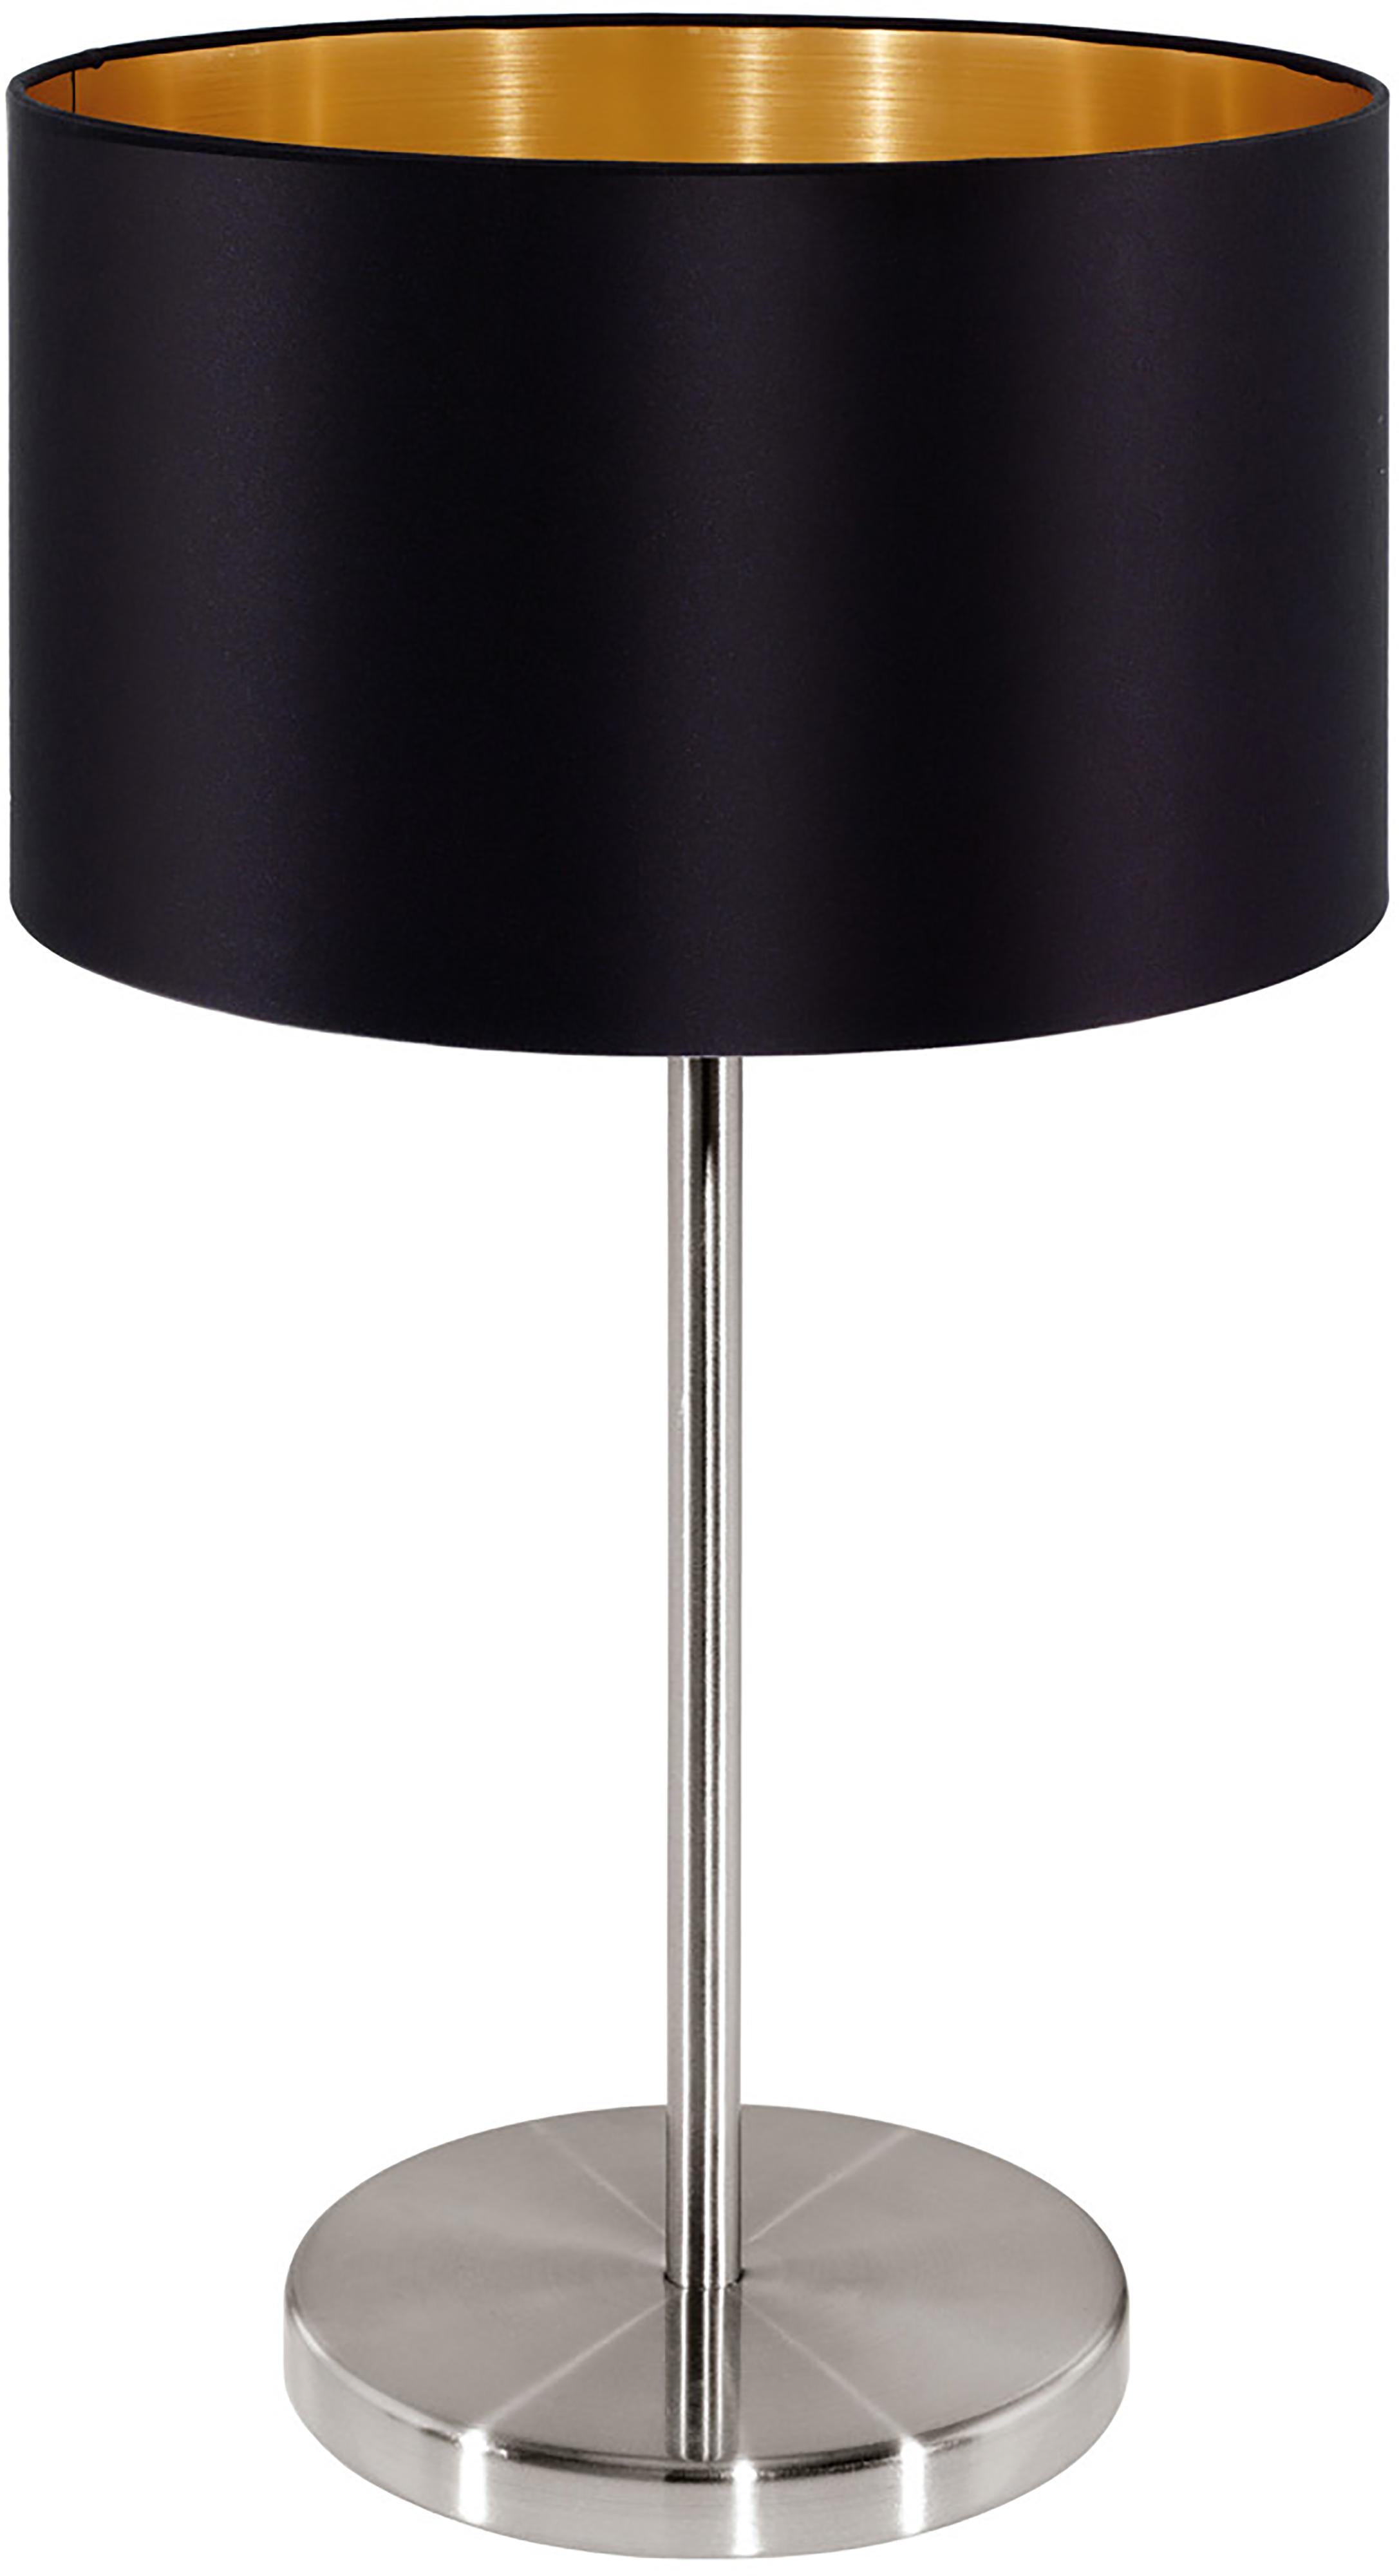 Tafellamp Jamie, Lampvoet: vernikkeld metaal, Fitting: vernikkeld metaal, Zwart, zilverkleurig, Ø 23 x H 42 cm